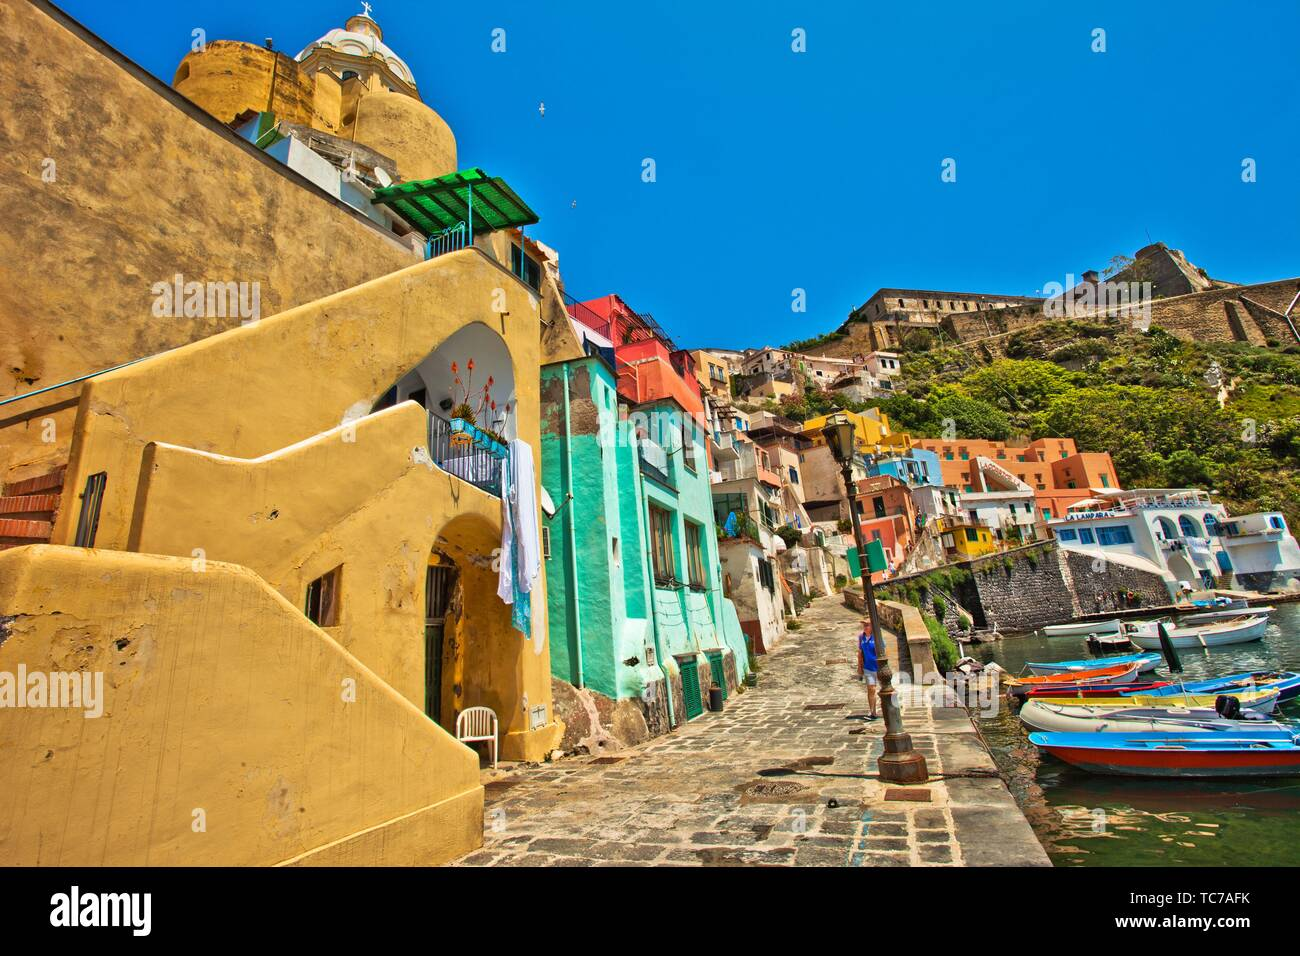 Procida, Phlegraean Islands, Gulf of Naples, Bay of Naples, Italy, Europe. - Stock Image